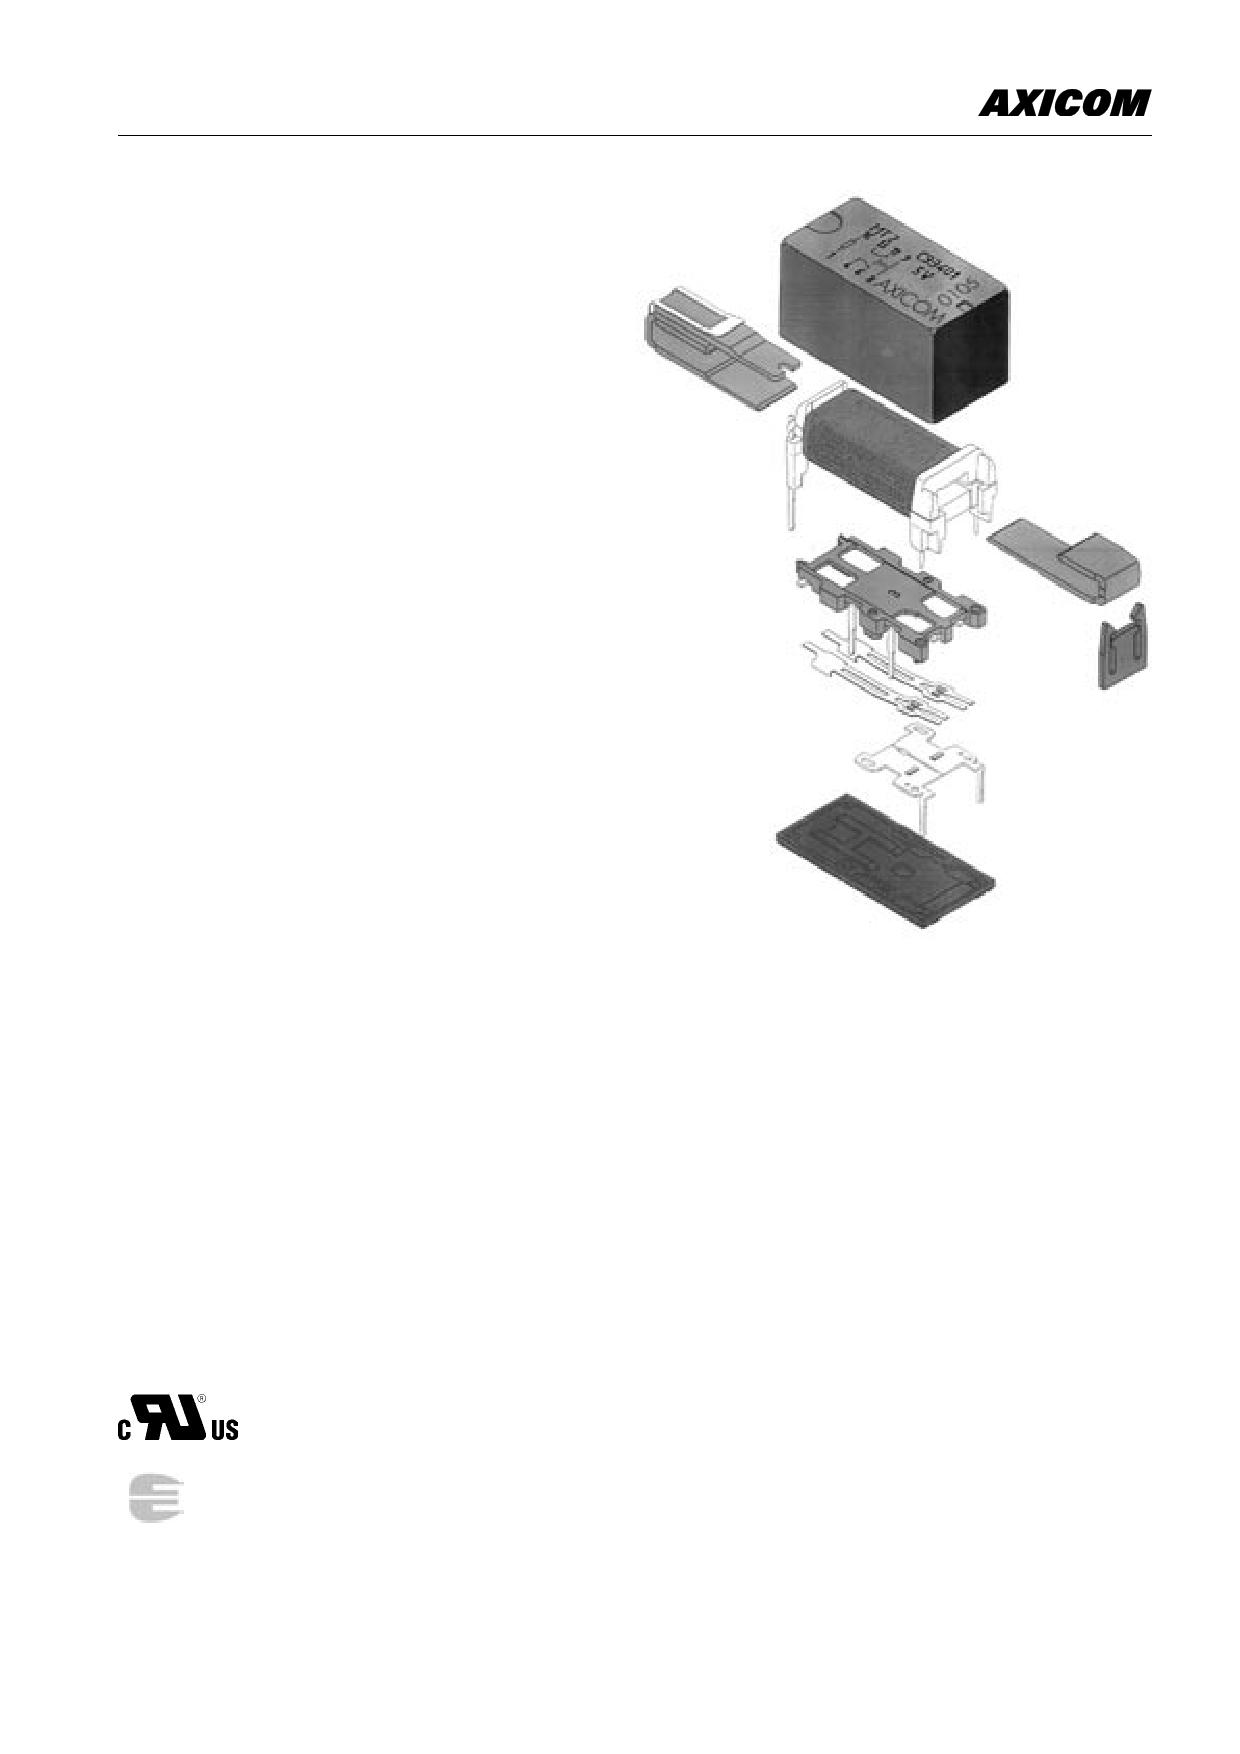 6-1462000-2 Даташит, Описание, Даташиты